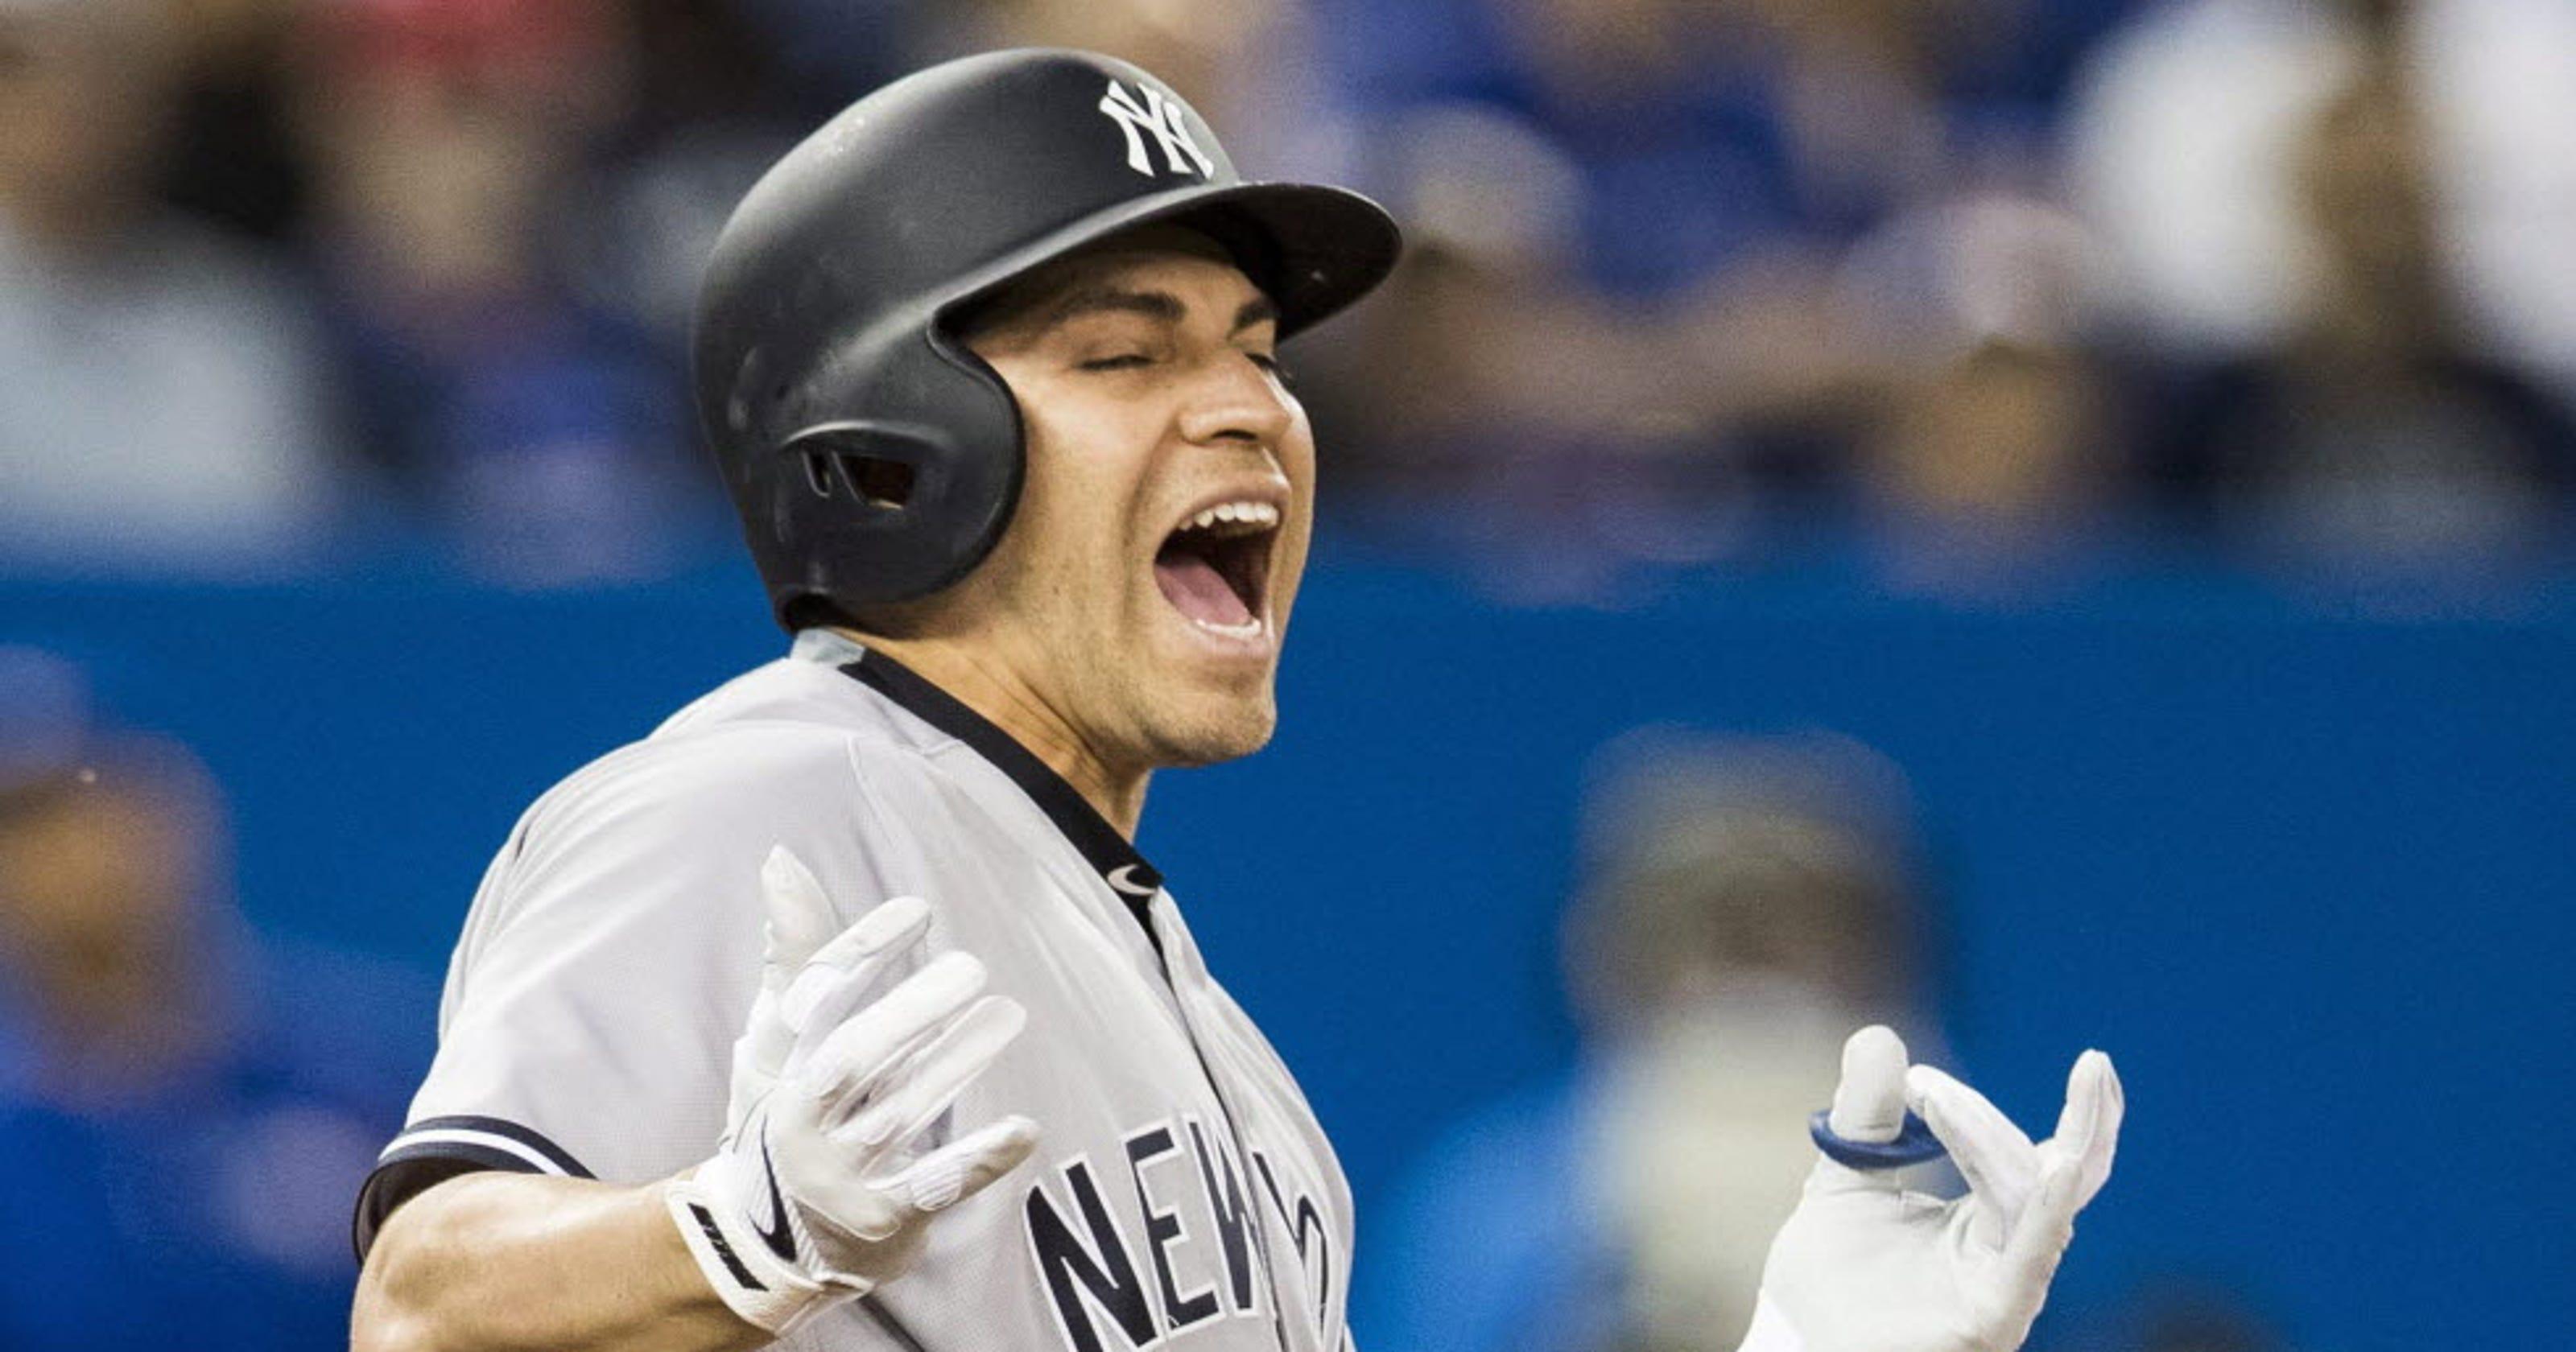 New York Yankees: Jacoby Ellsbury among worst contracts ever